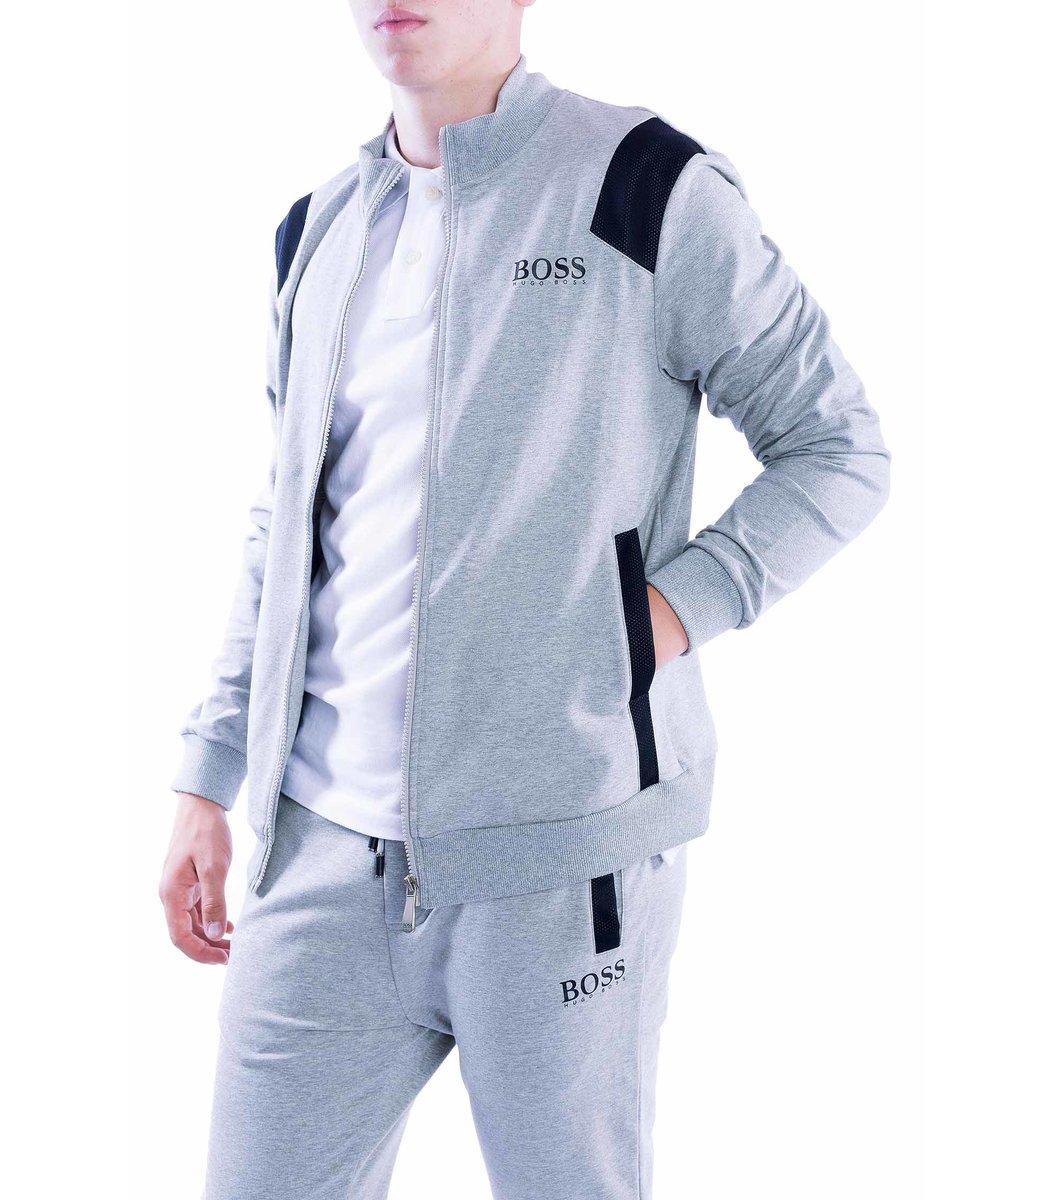 Спортивный костюм Hugo Boss Training Серый